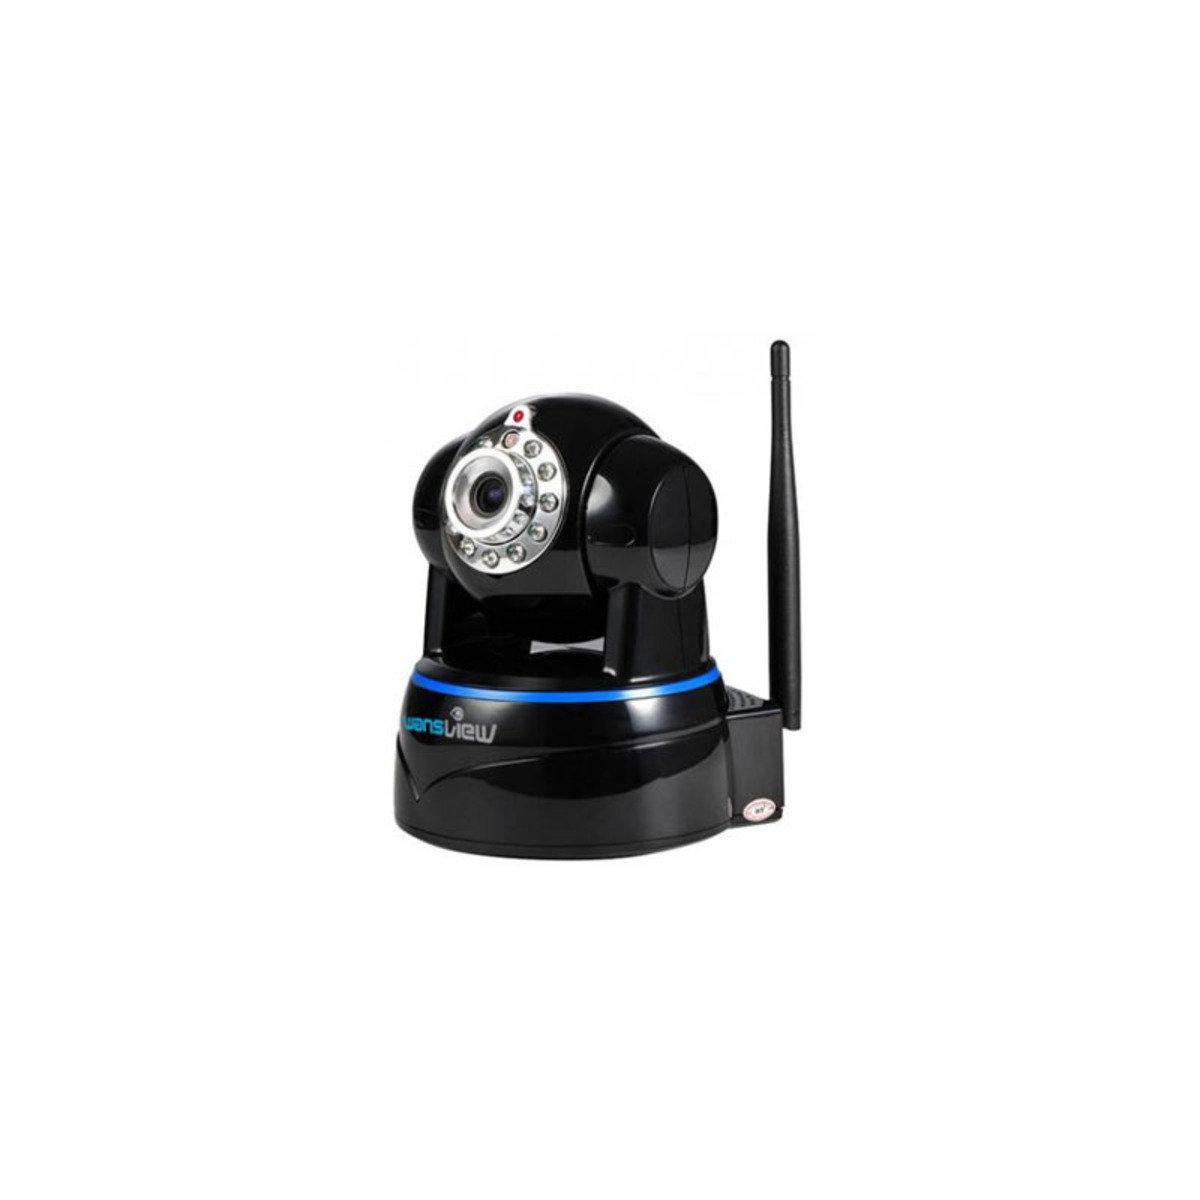 1080p 全高清旋轉式多角度無線網路攝影機 NCM620GA